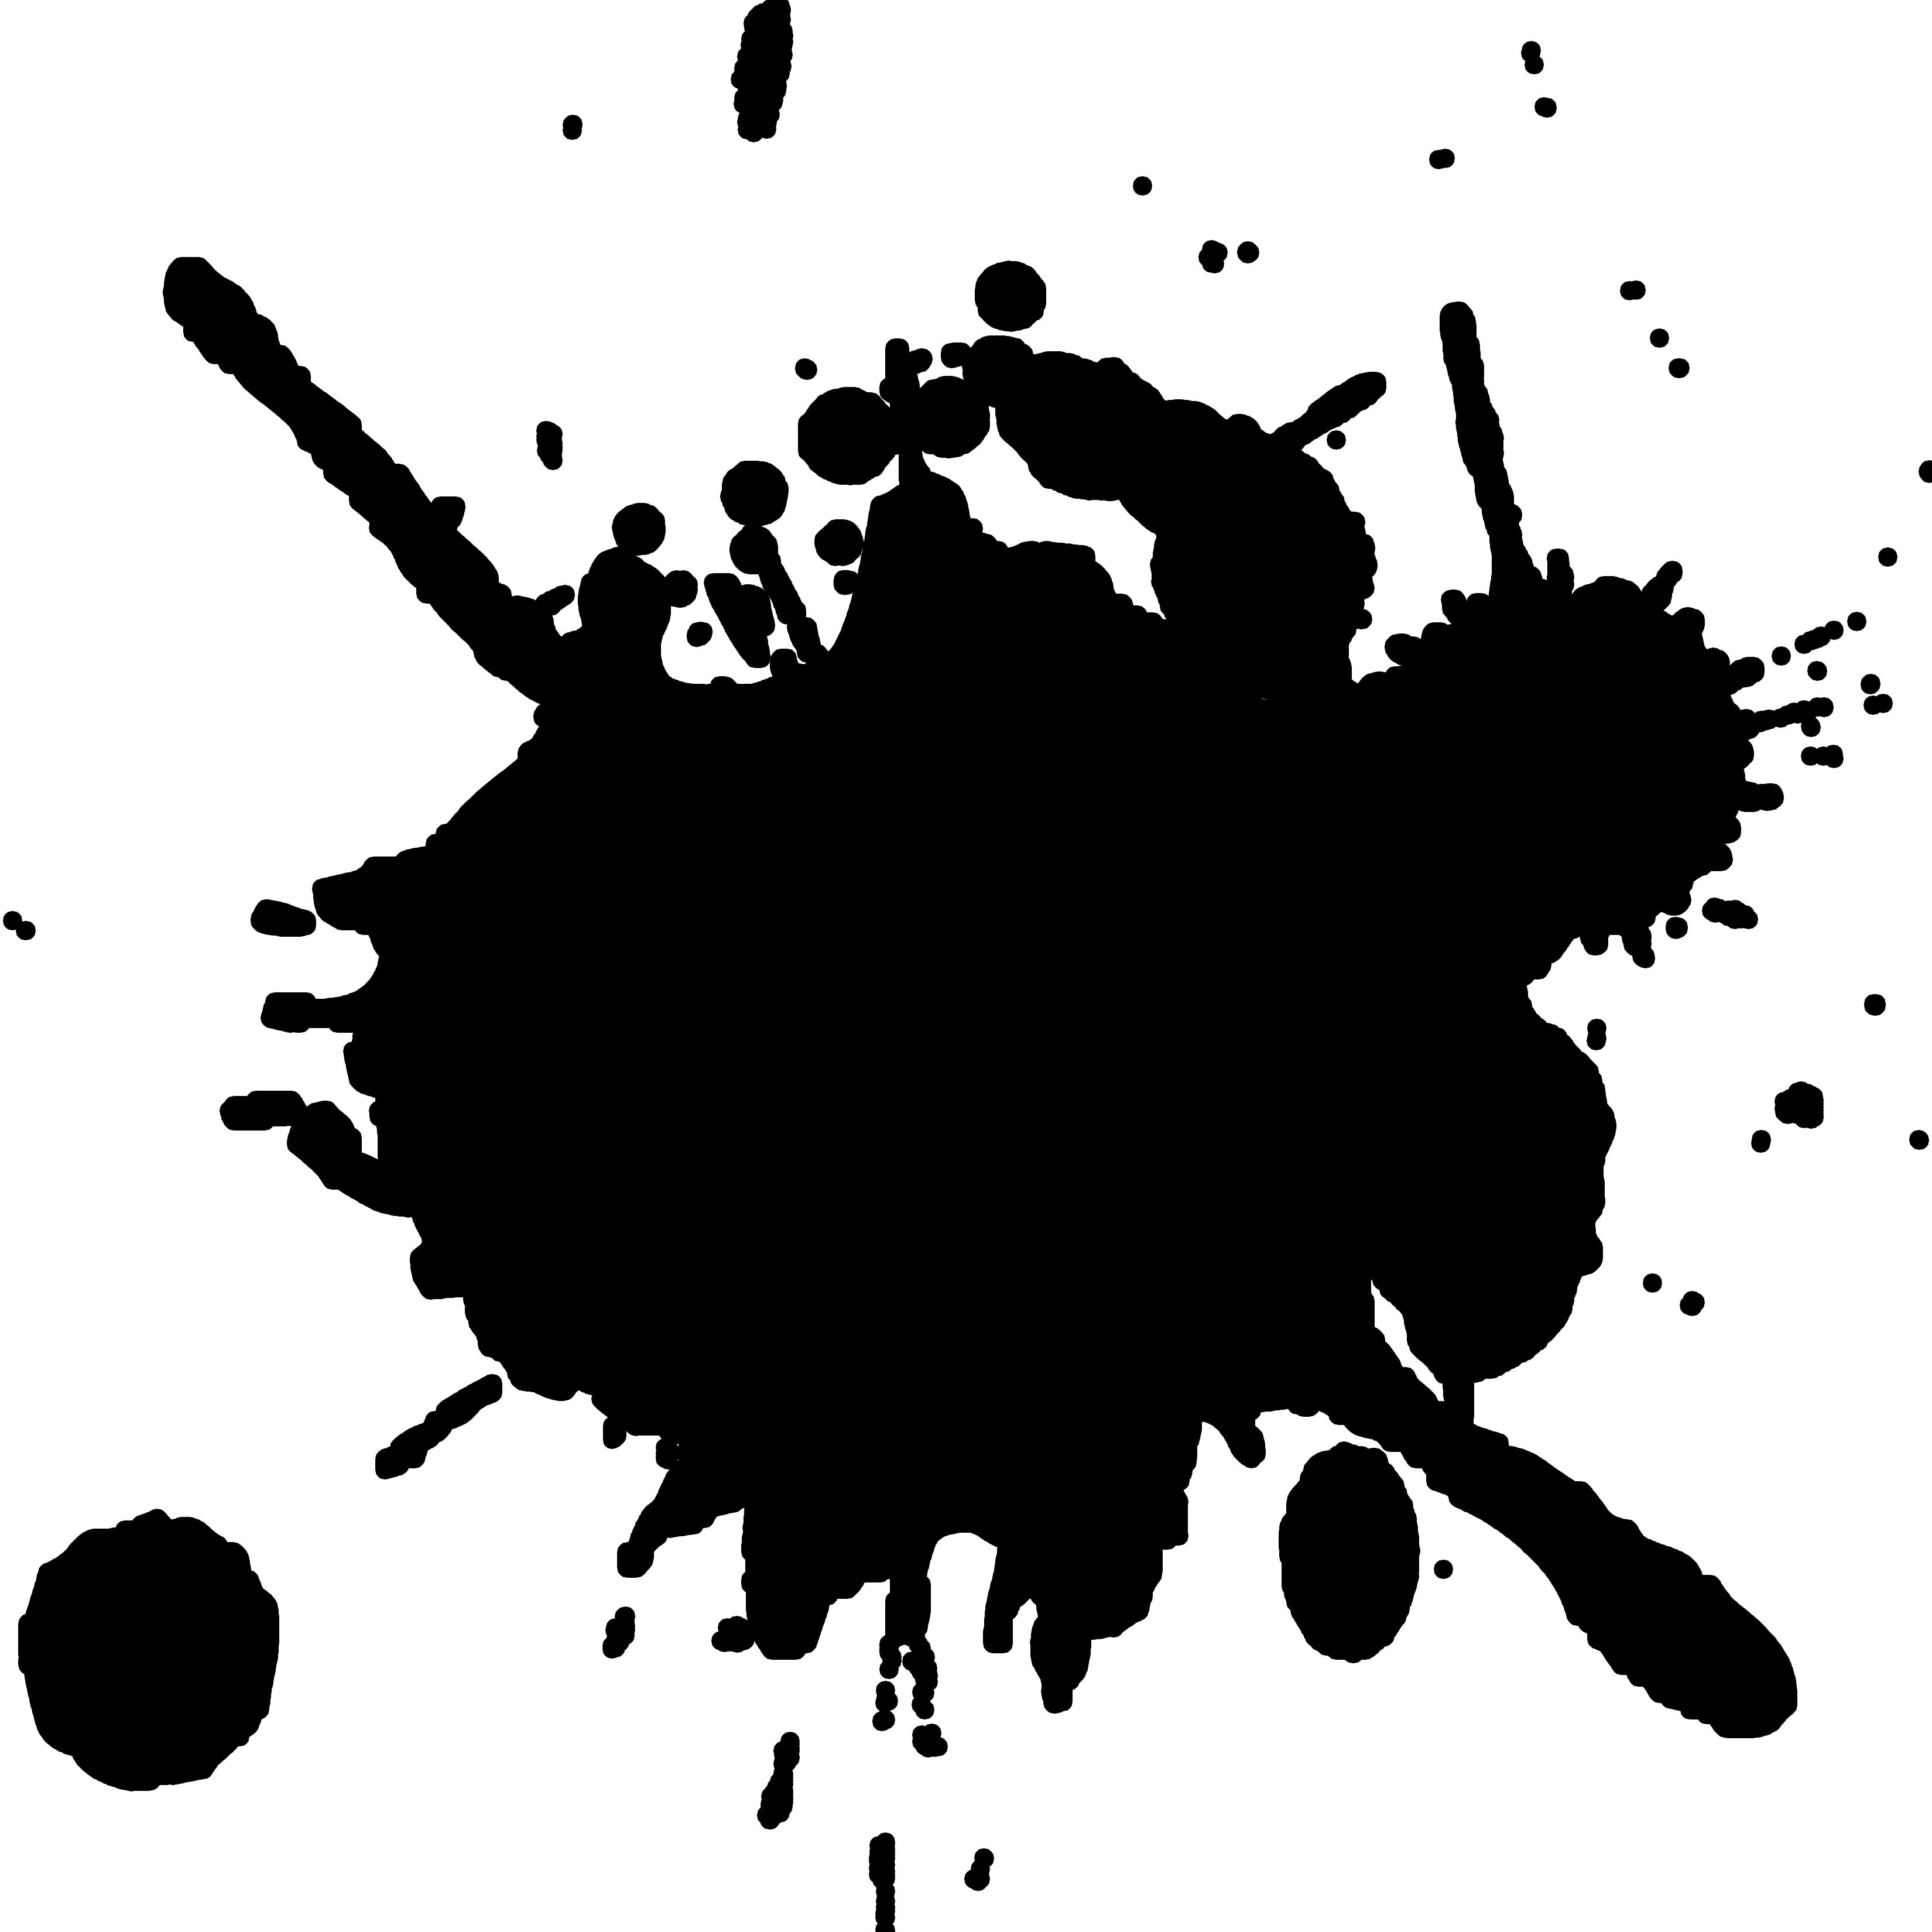 Splatter clipart Download Splatter #15 clipart Download